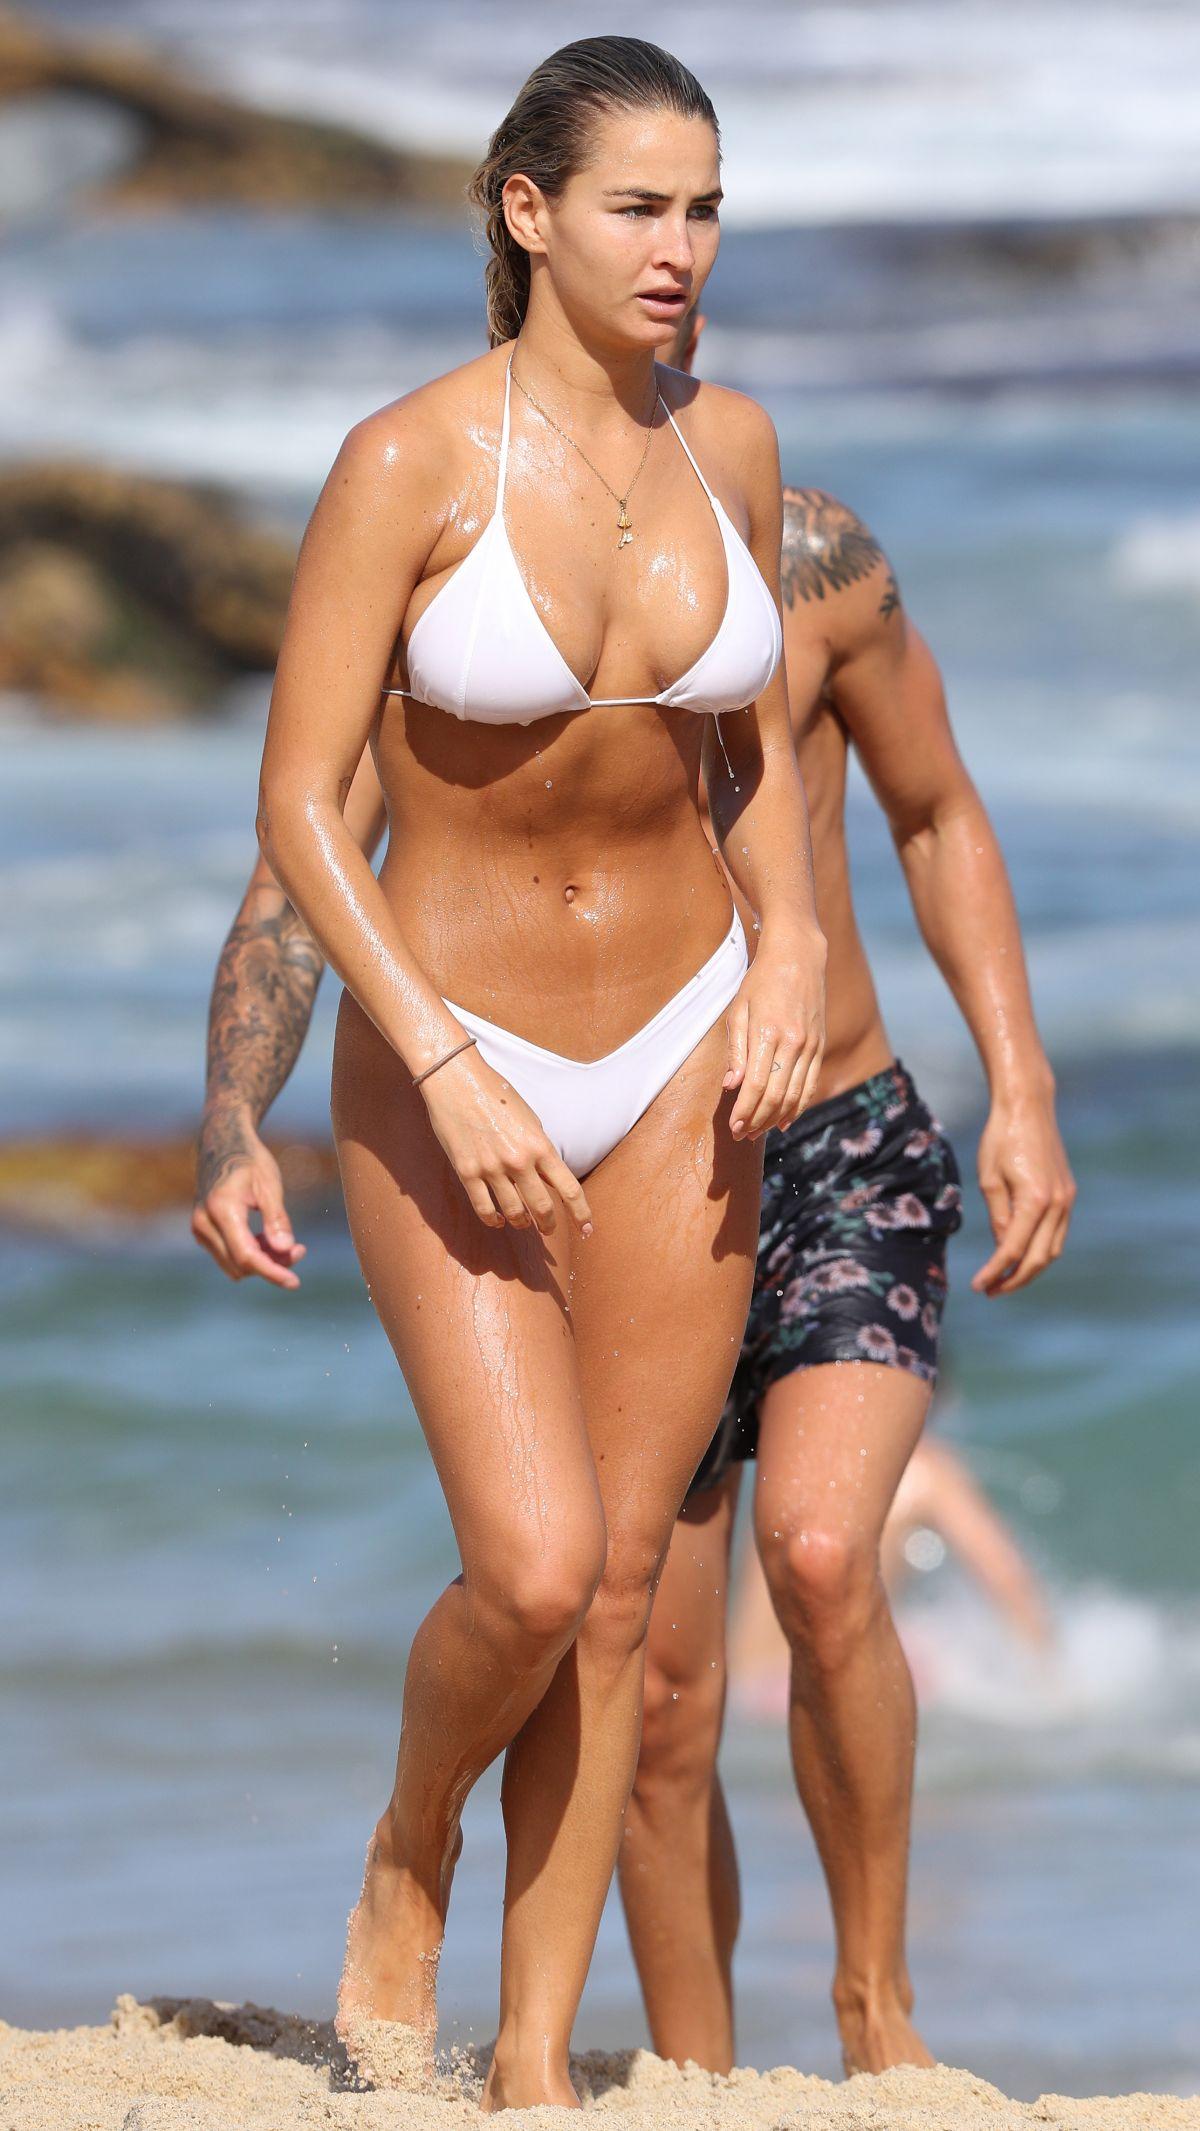 Bikini Amelia Jane nudes (11 photos), Topless, Leaked, Selfie, see through 2015